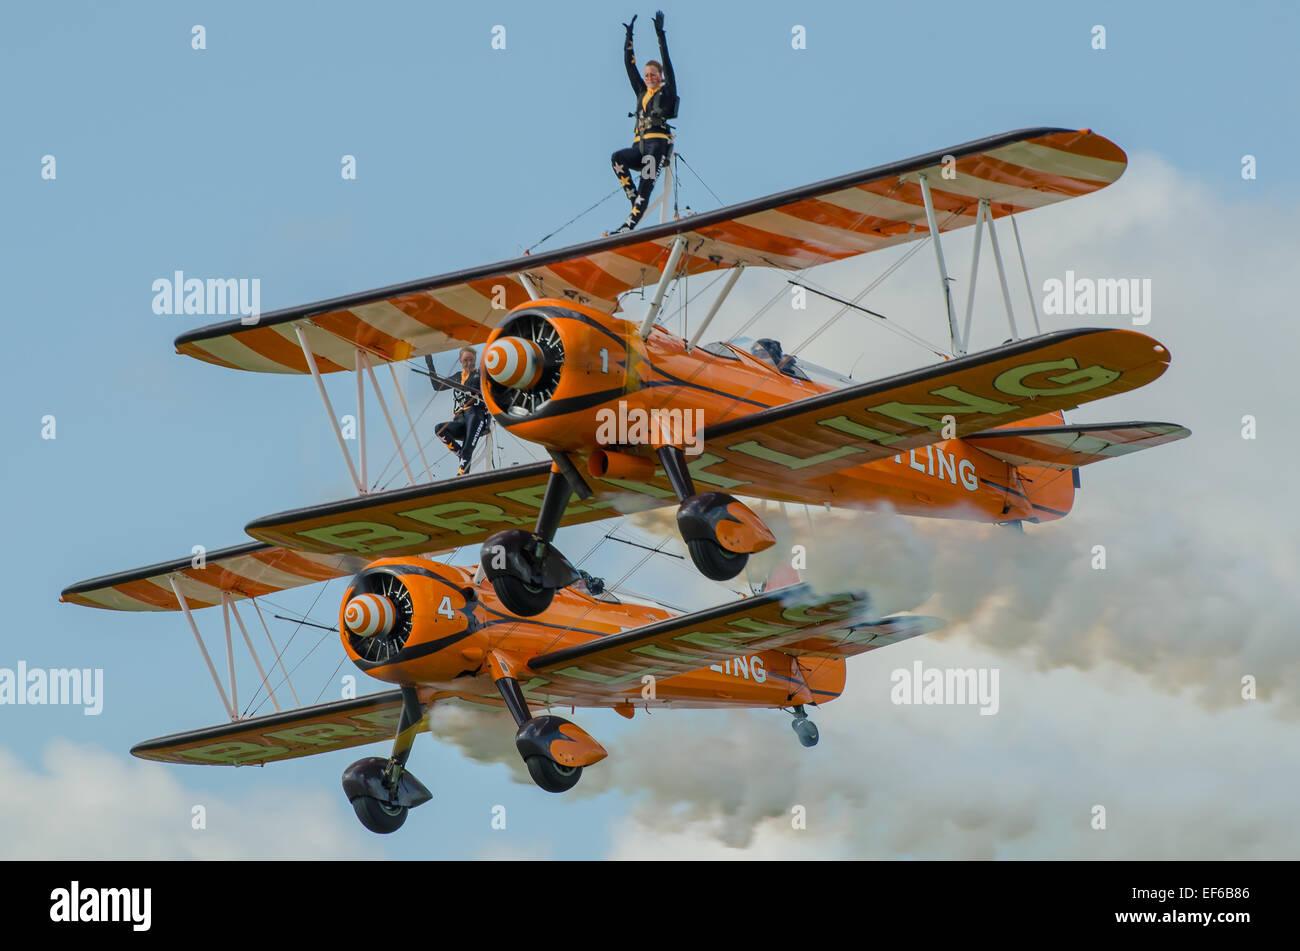 aerosuperbatics-ltd-is-a-british-aerobatics-and-wingwalking-team-as-EF6B86.jpg